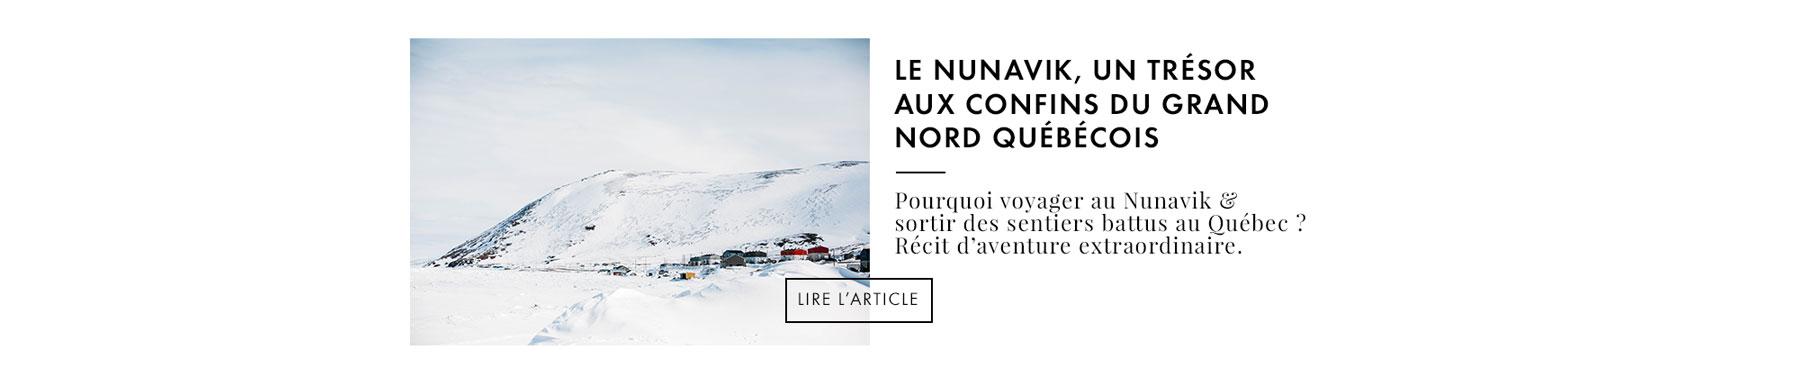 voyage au Nunavik blog Québec